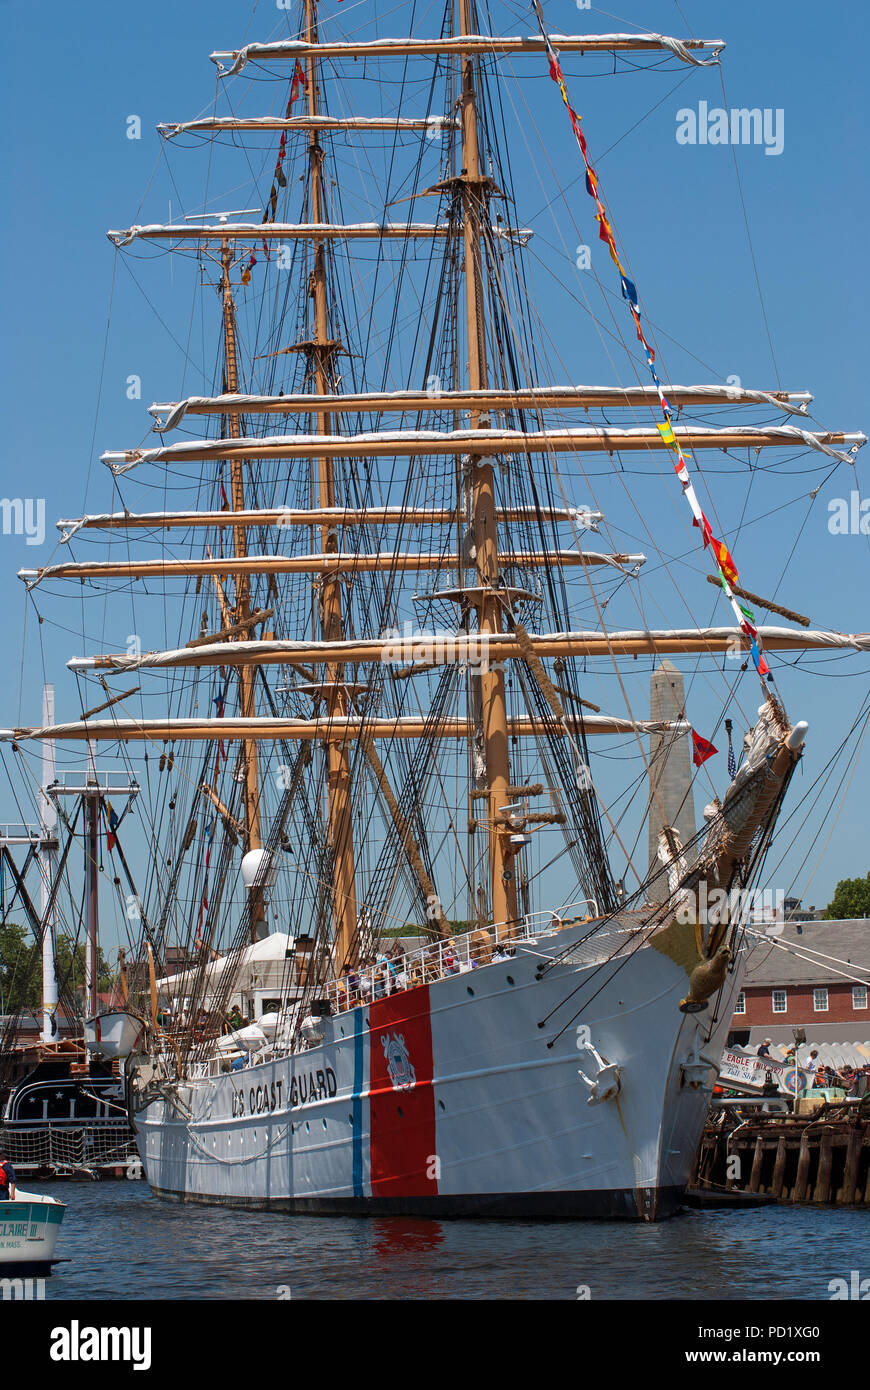 U.S. Coast Guard sailing ship, Sail Boston Tall Ship Festival, Boston Harbor, Suffolk County, Massachusetts, USA - Stock Image